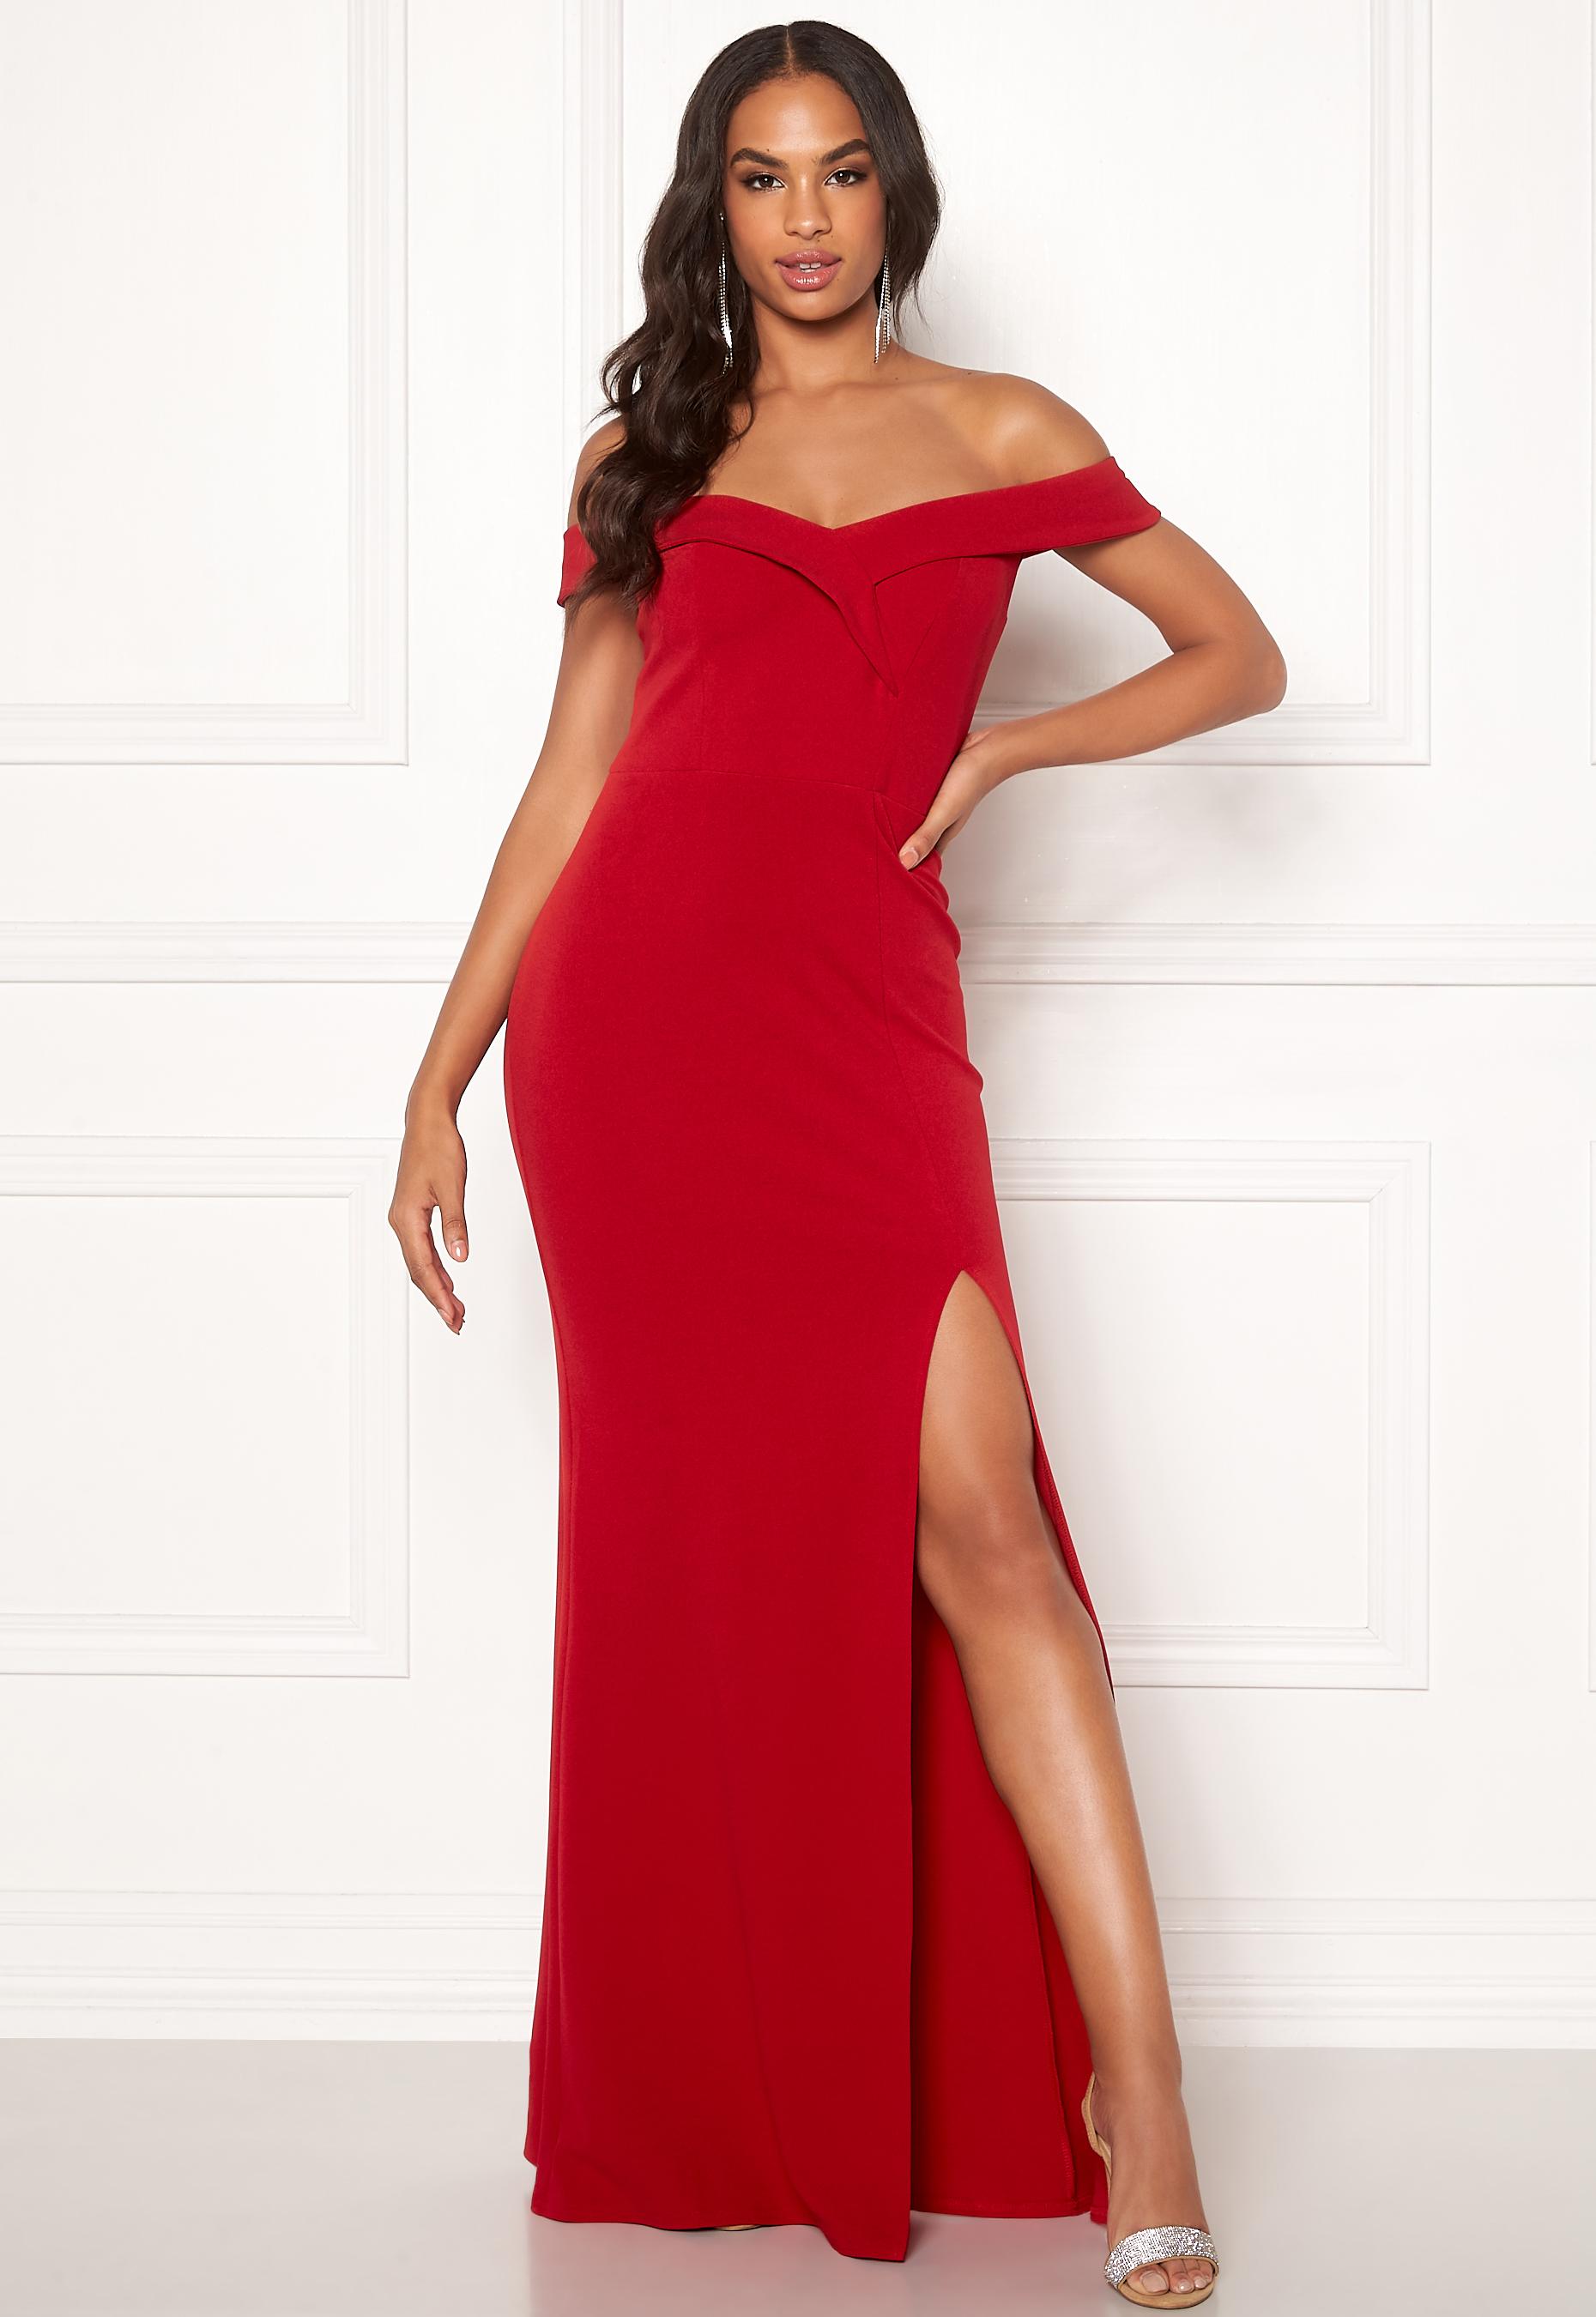 Red Sweetheart Floor Length Dress